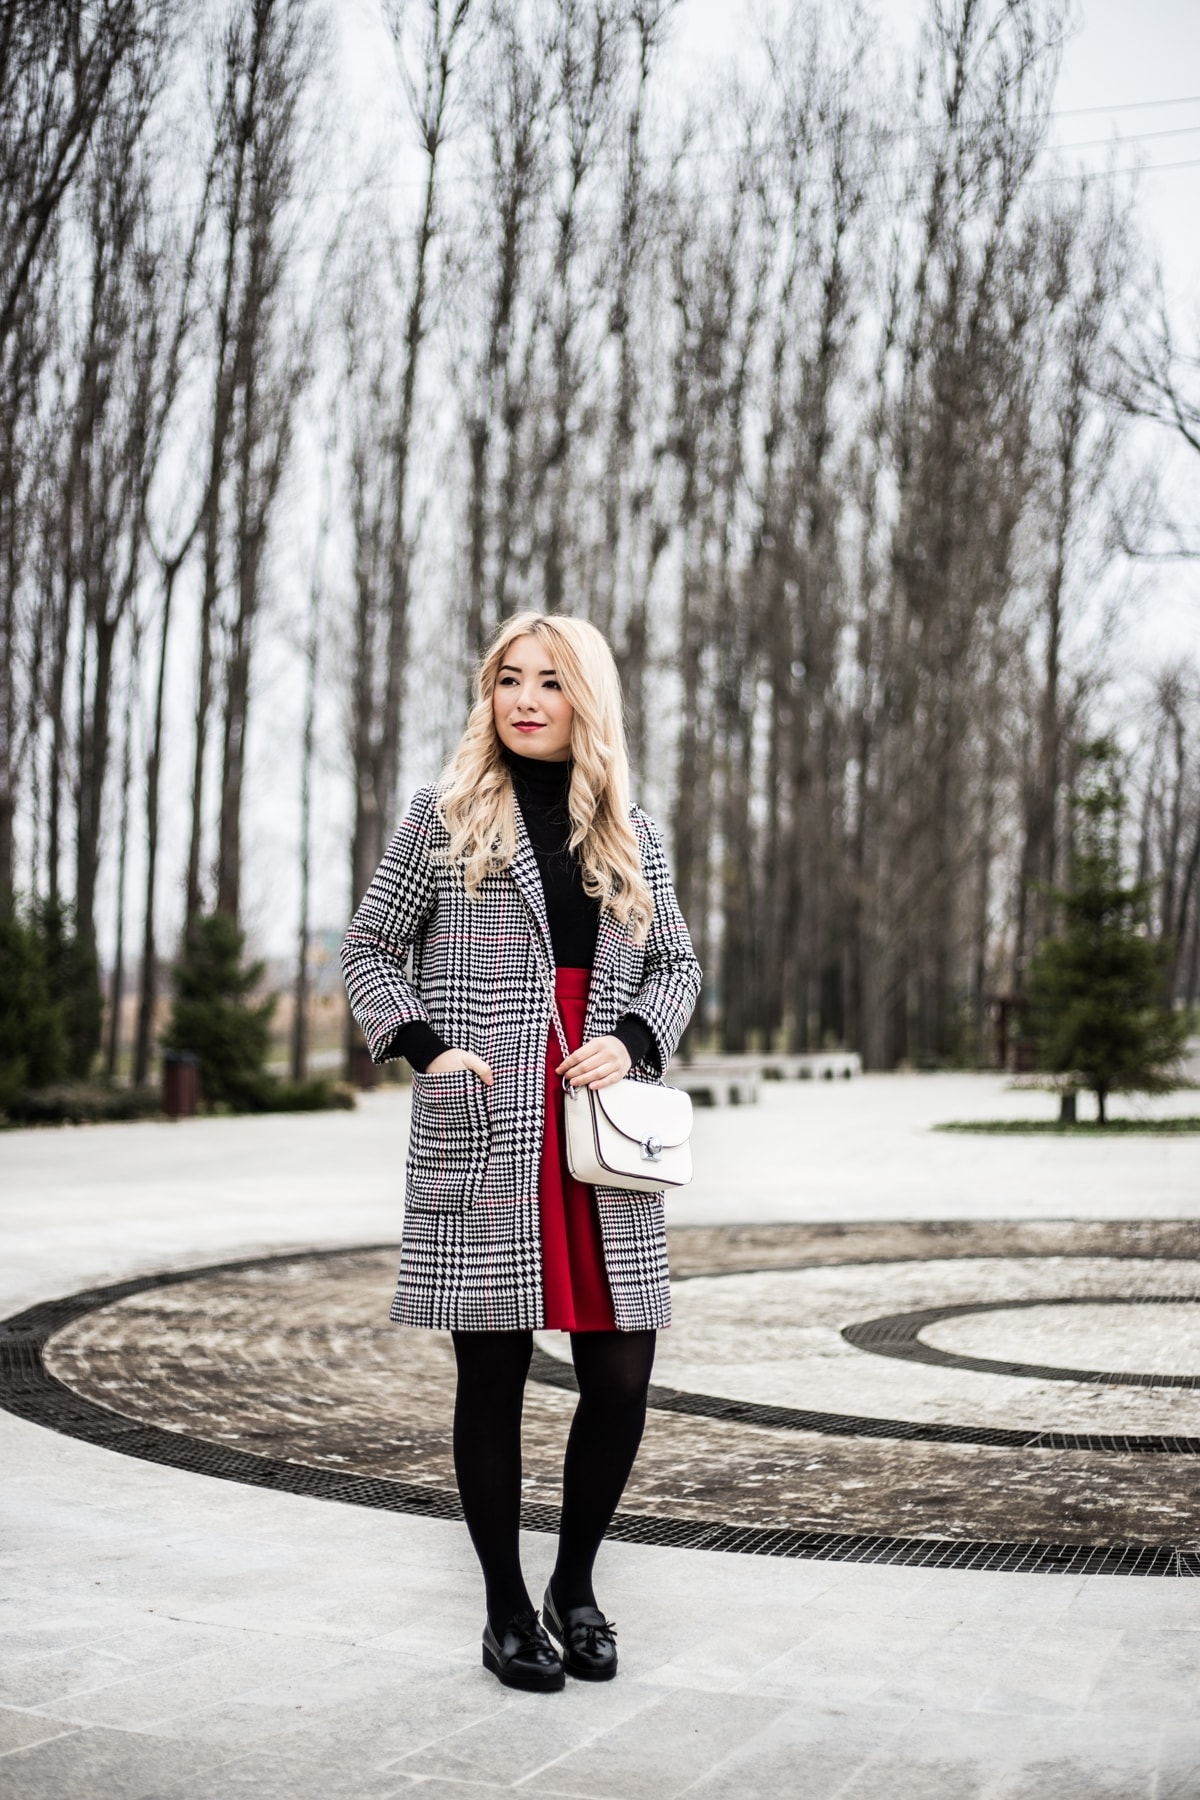 street style, plaide coat, tartan coat, red skirt, winter outfit, black loafers, black turtleneck, white crossbody bag, blogger, fashion, ootd, andreea ristea